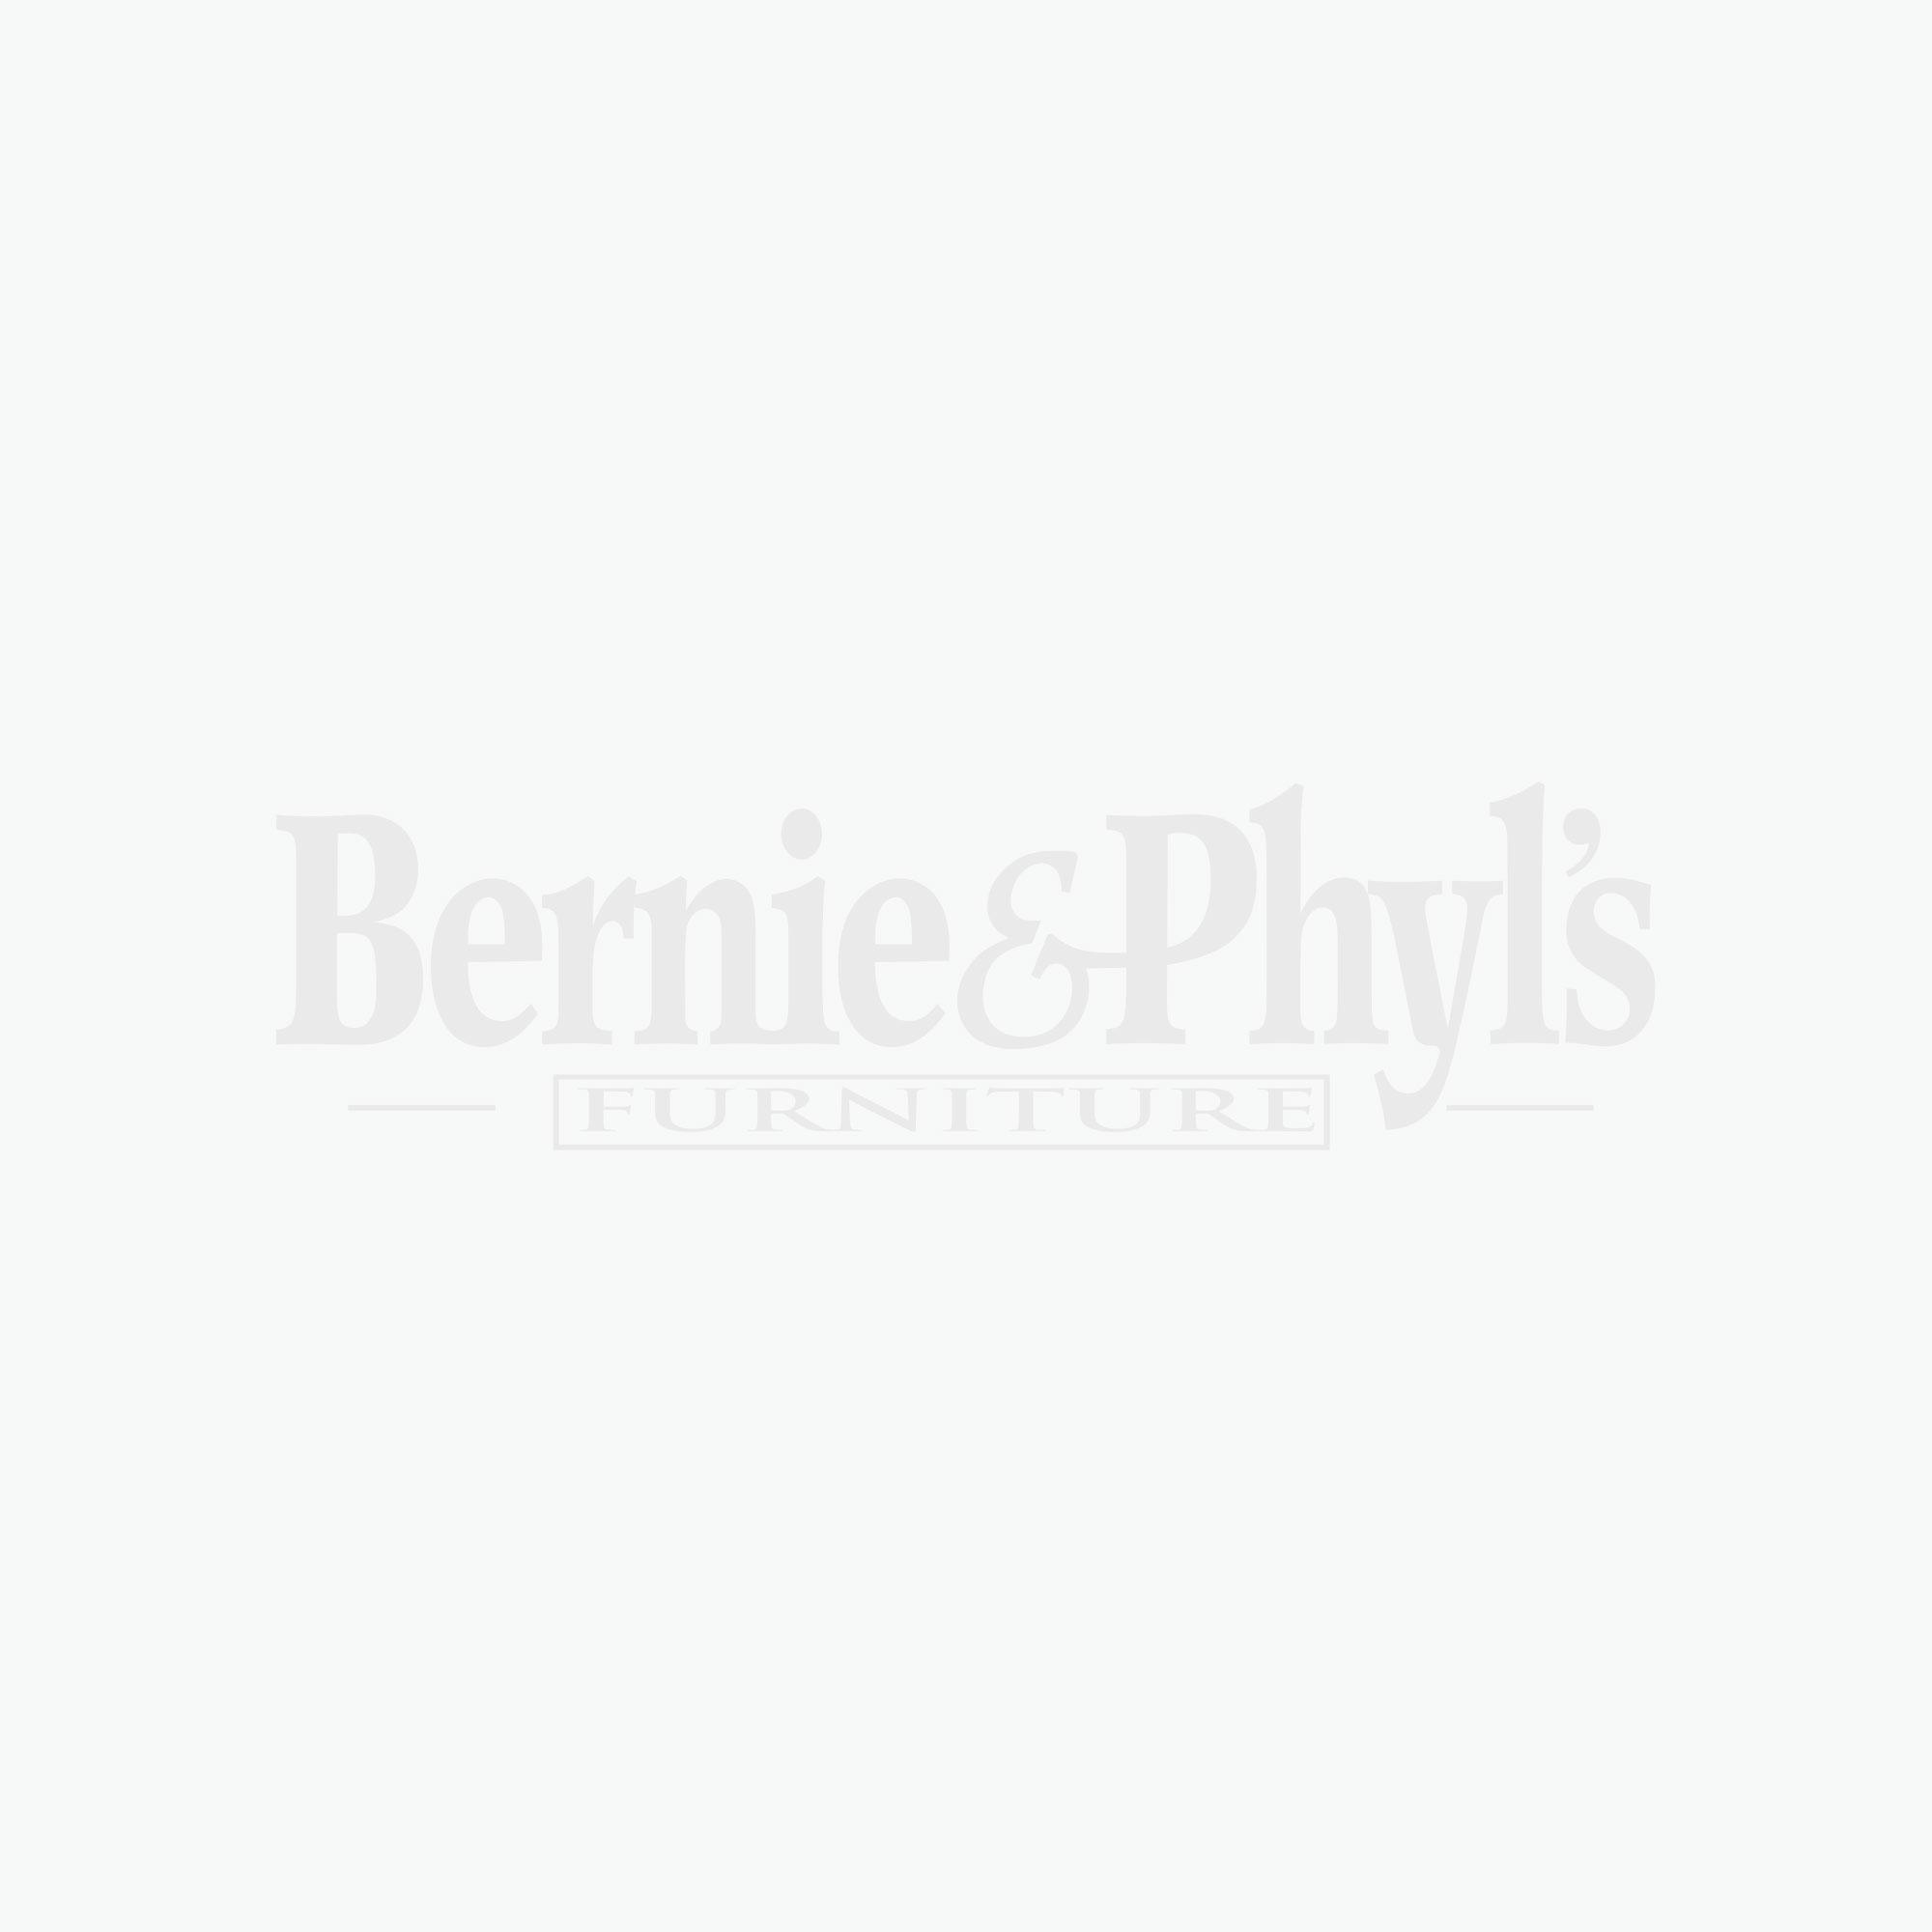 Hamilton Franklin Panel Bed Bernie Amp Phyl S Furniture